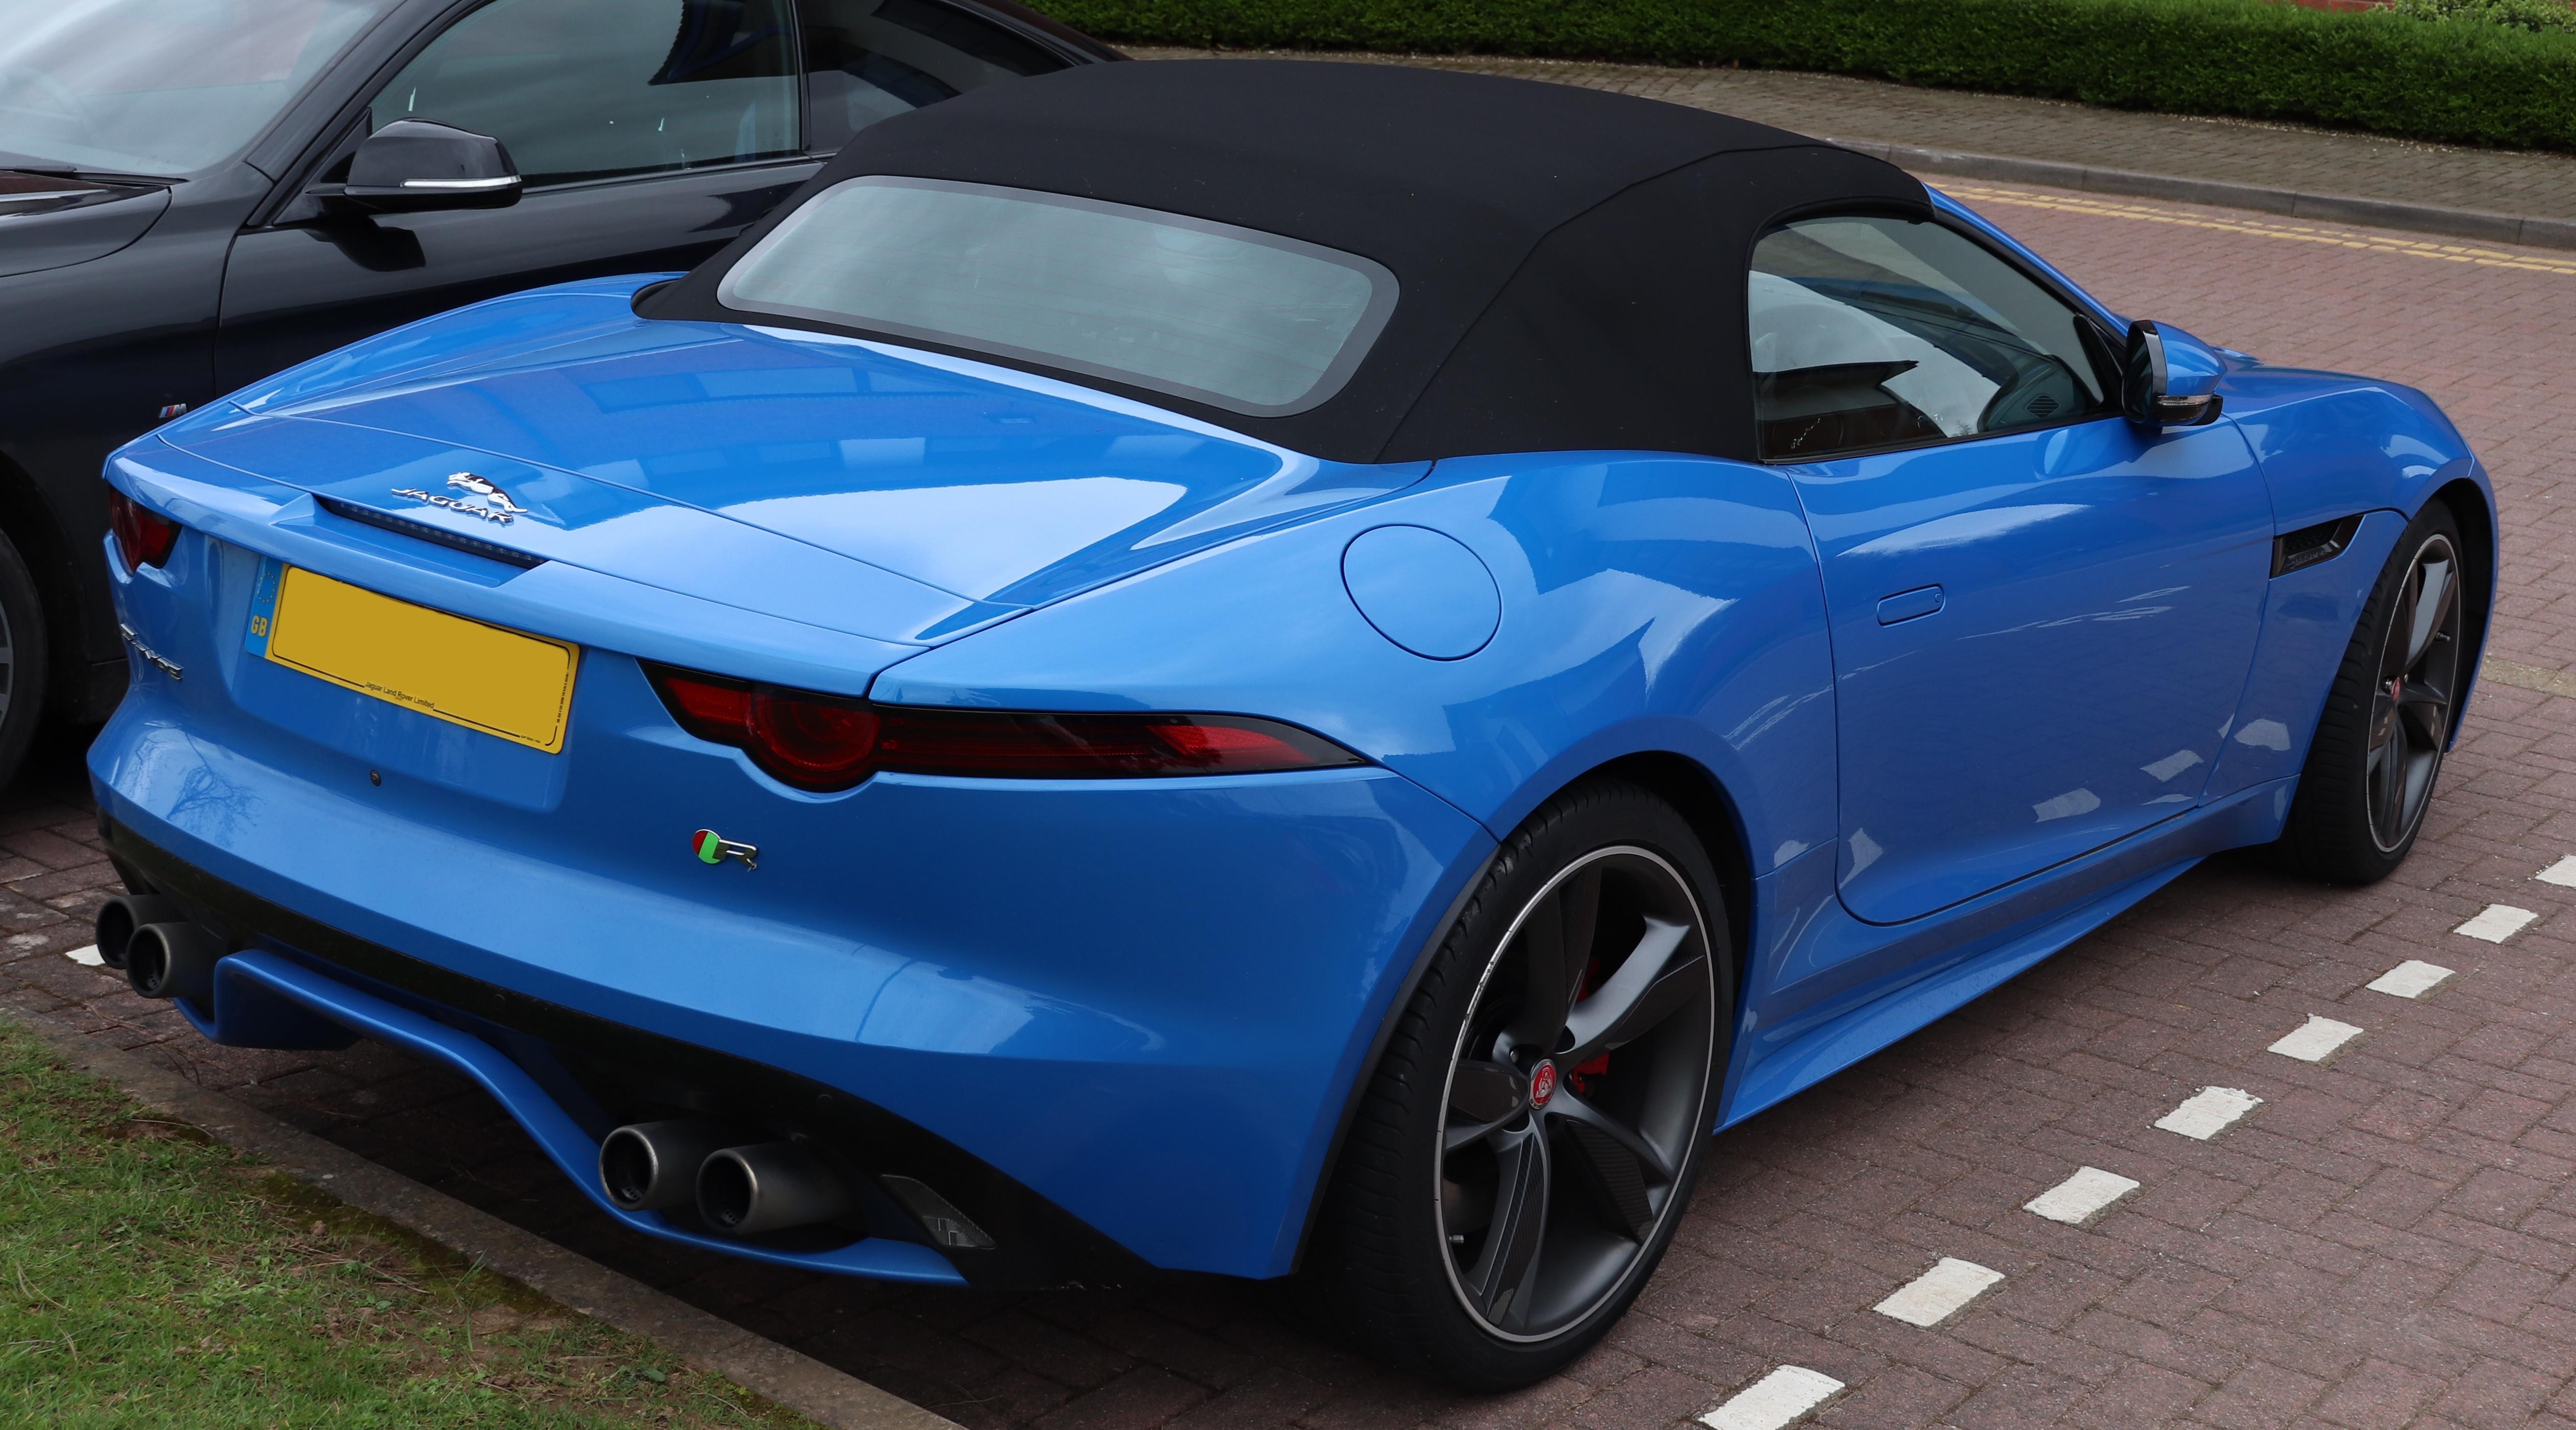 File:2017 Jaguar F-Type Convertible V8 R AWD Automatic 5.0 ...